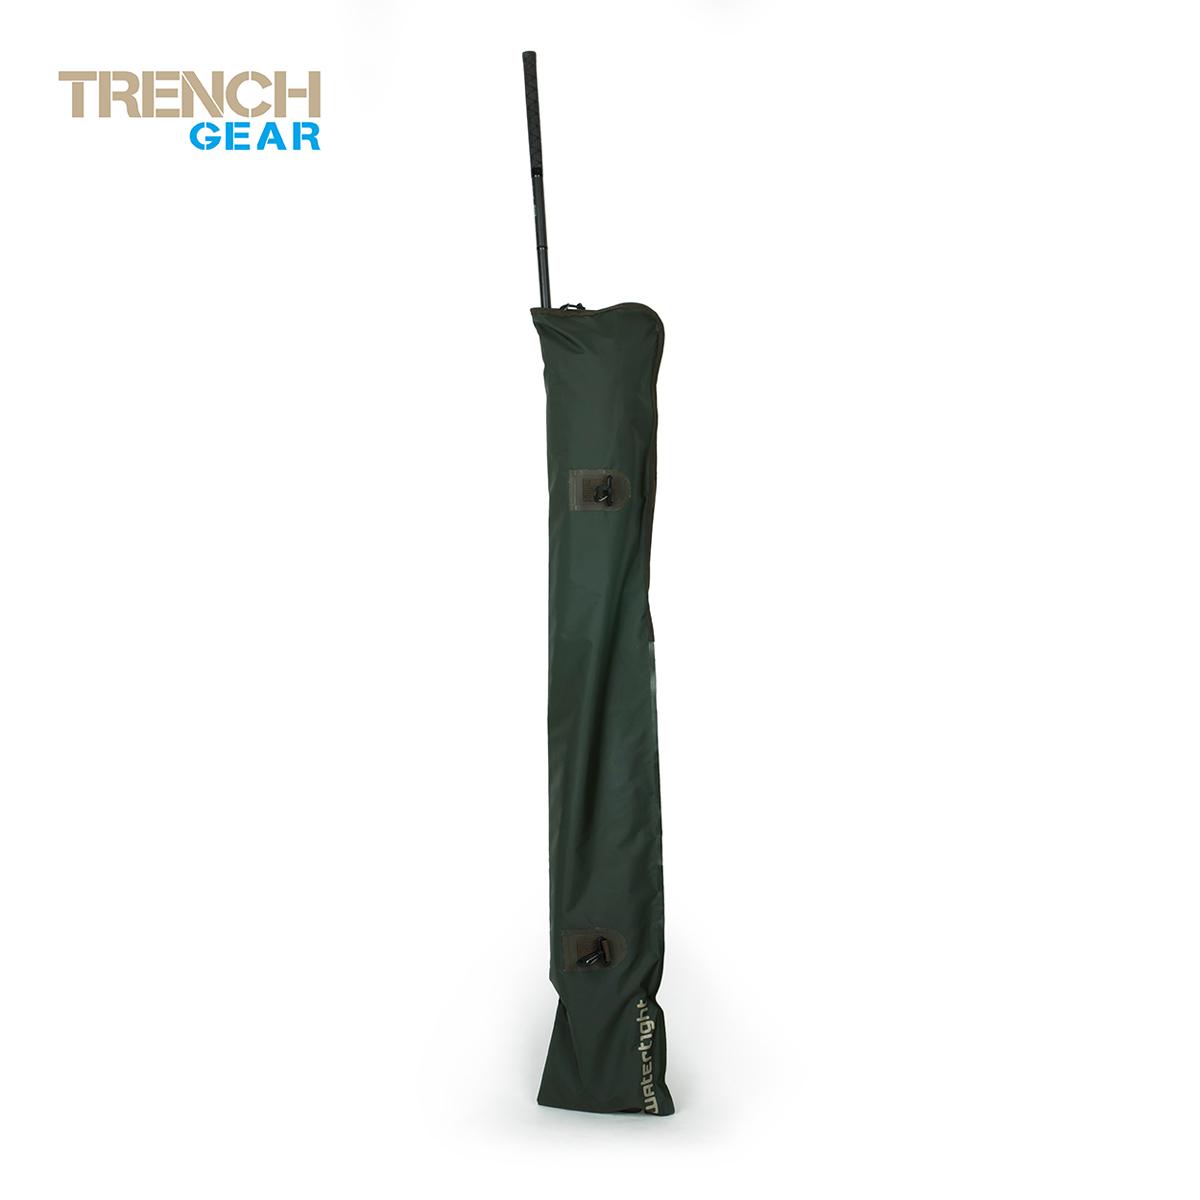 Shimano Trench Stink & Stick Bag Incl. Aero Qvr Strap Advanced